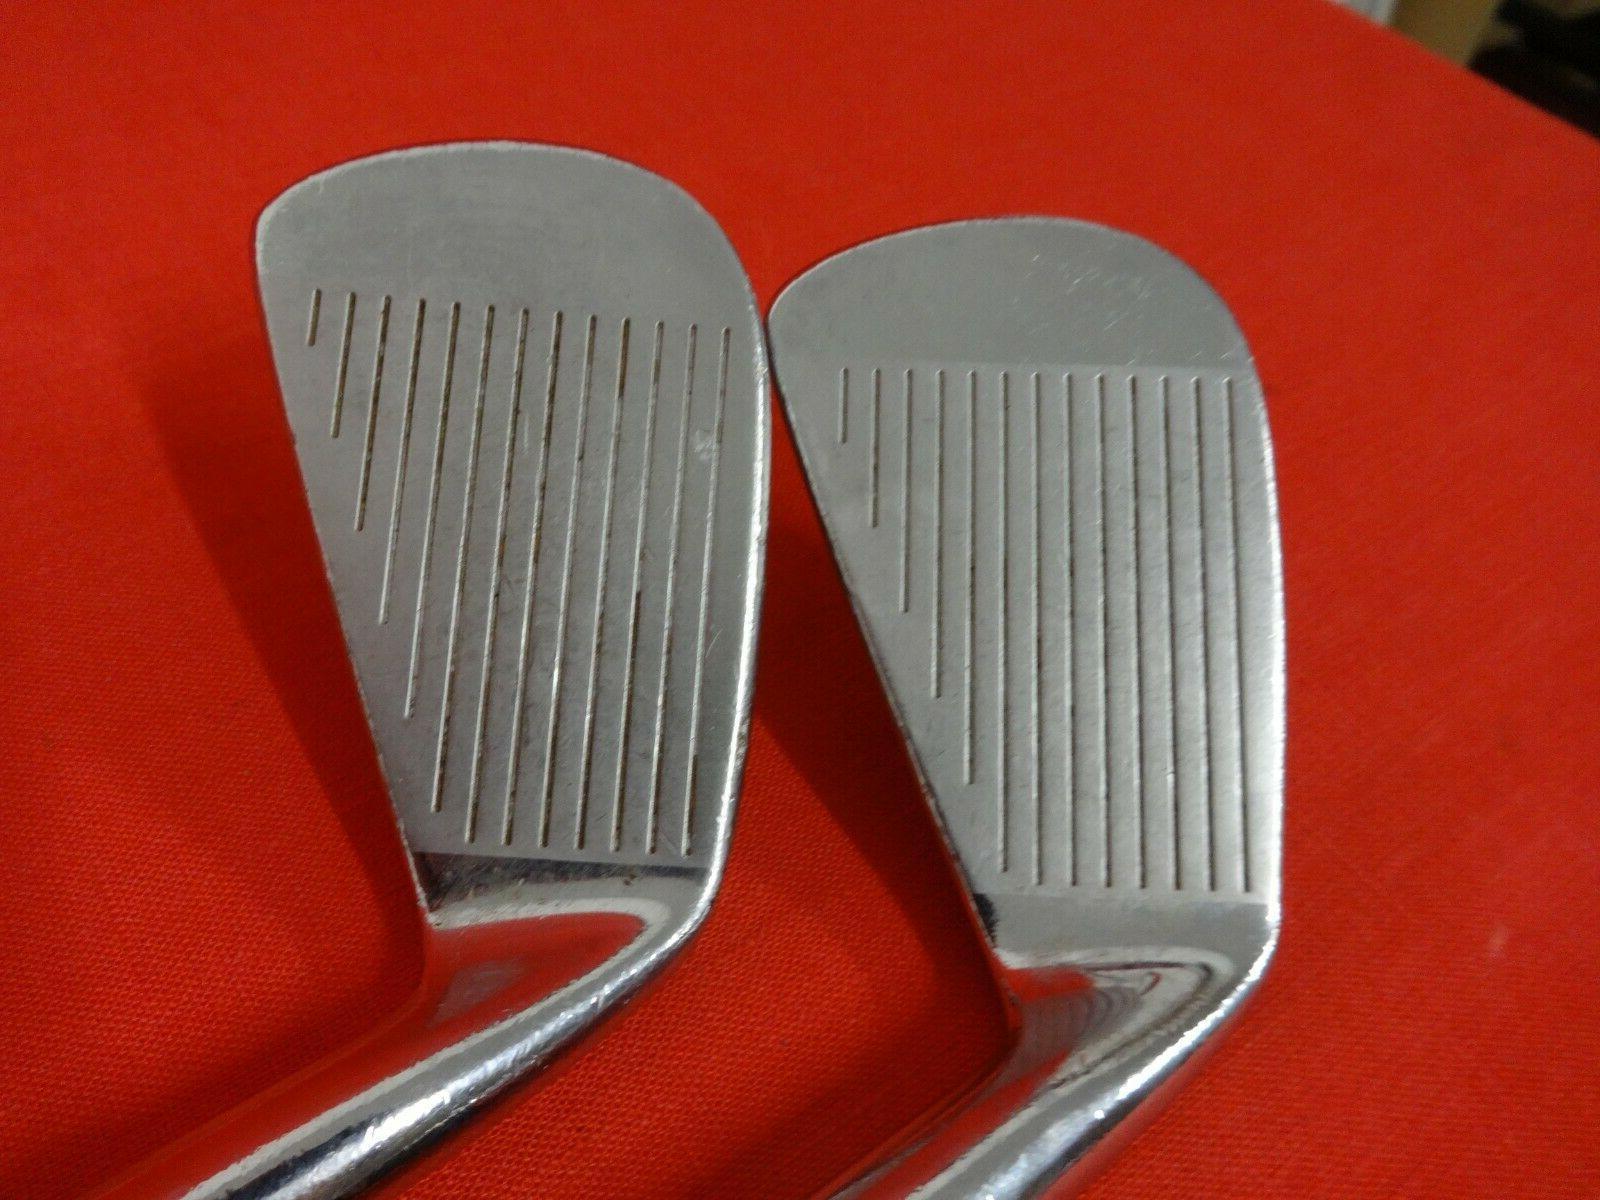 3-PW Iron Right Handed DG Stiff Steel